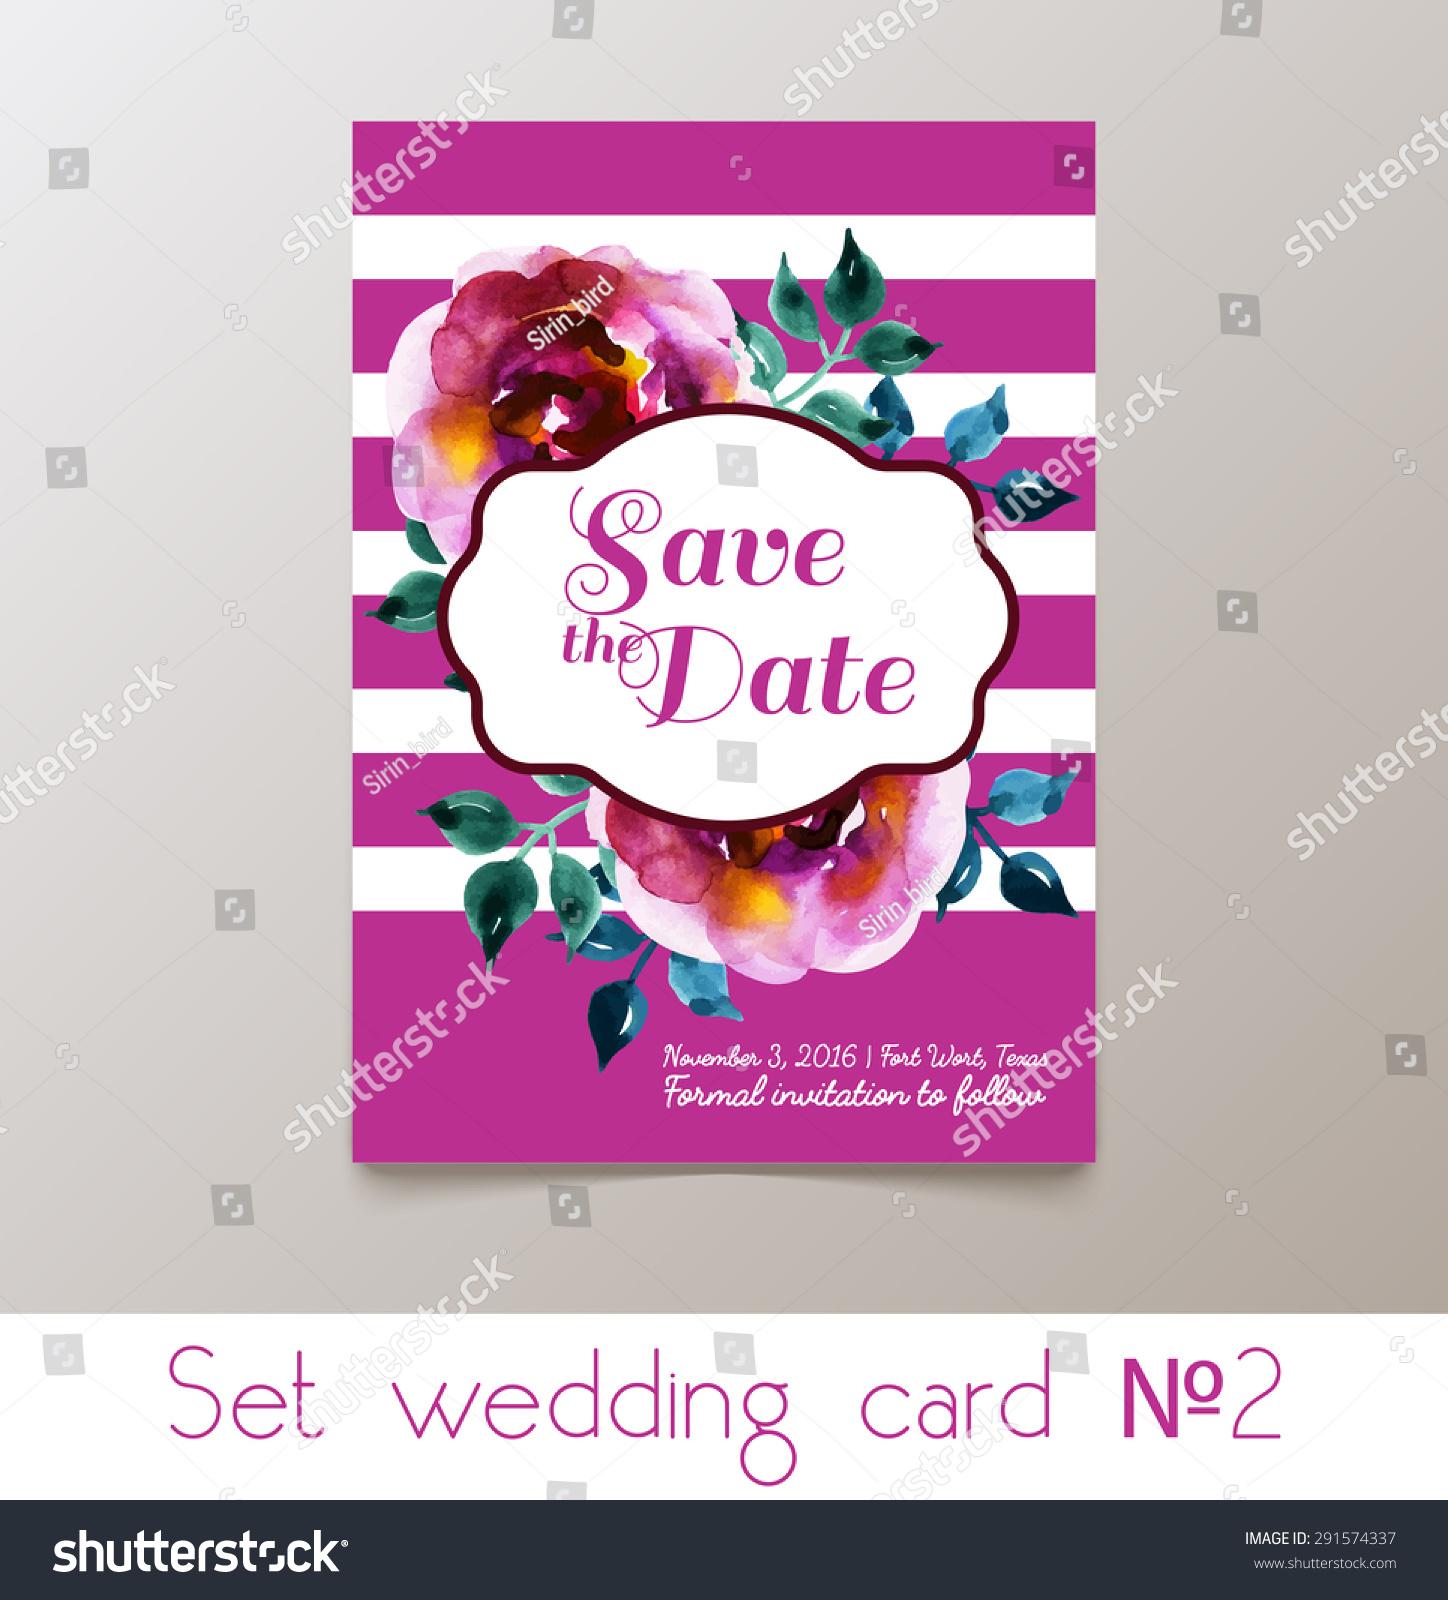 Set Weddings Bachelorette Party Invitation Thank Stock Vector ...